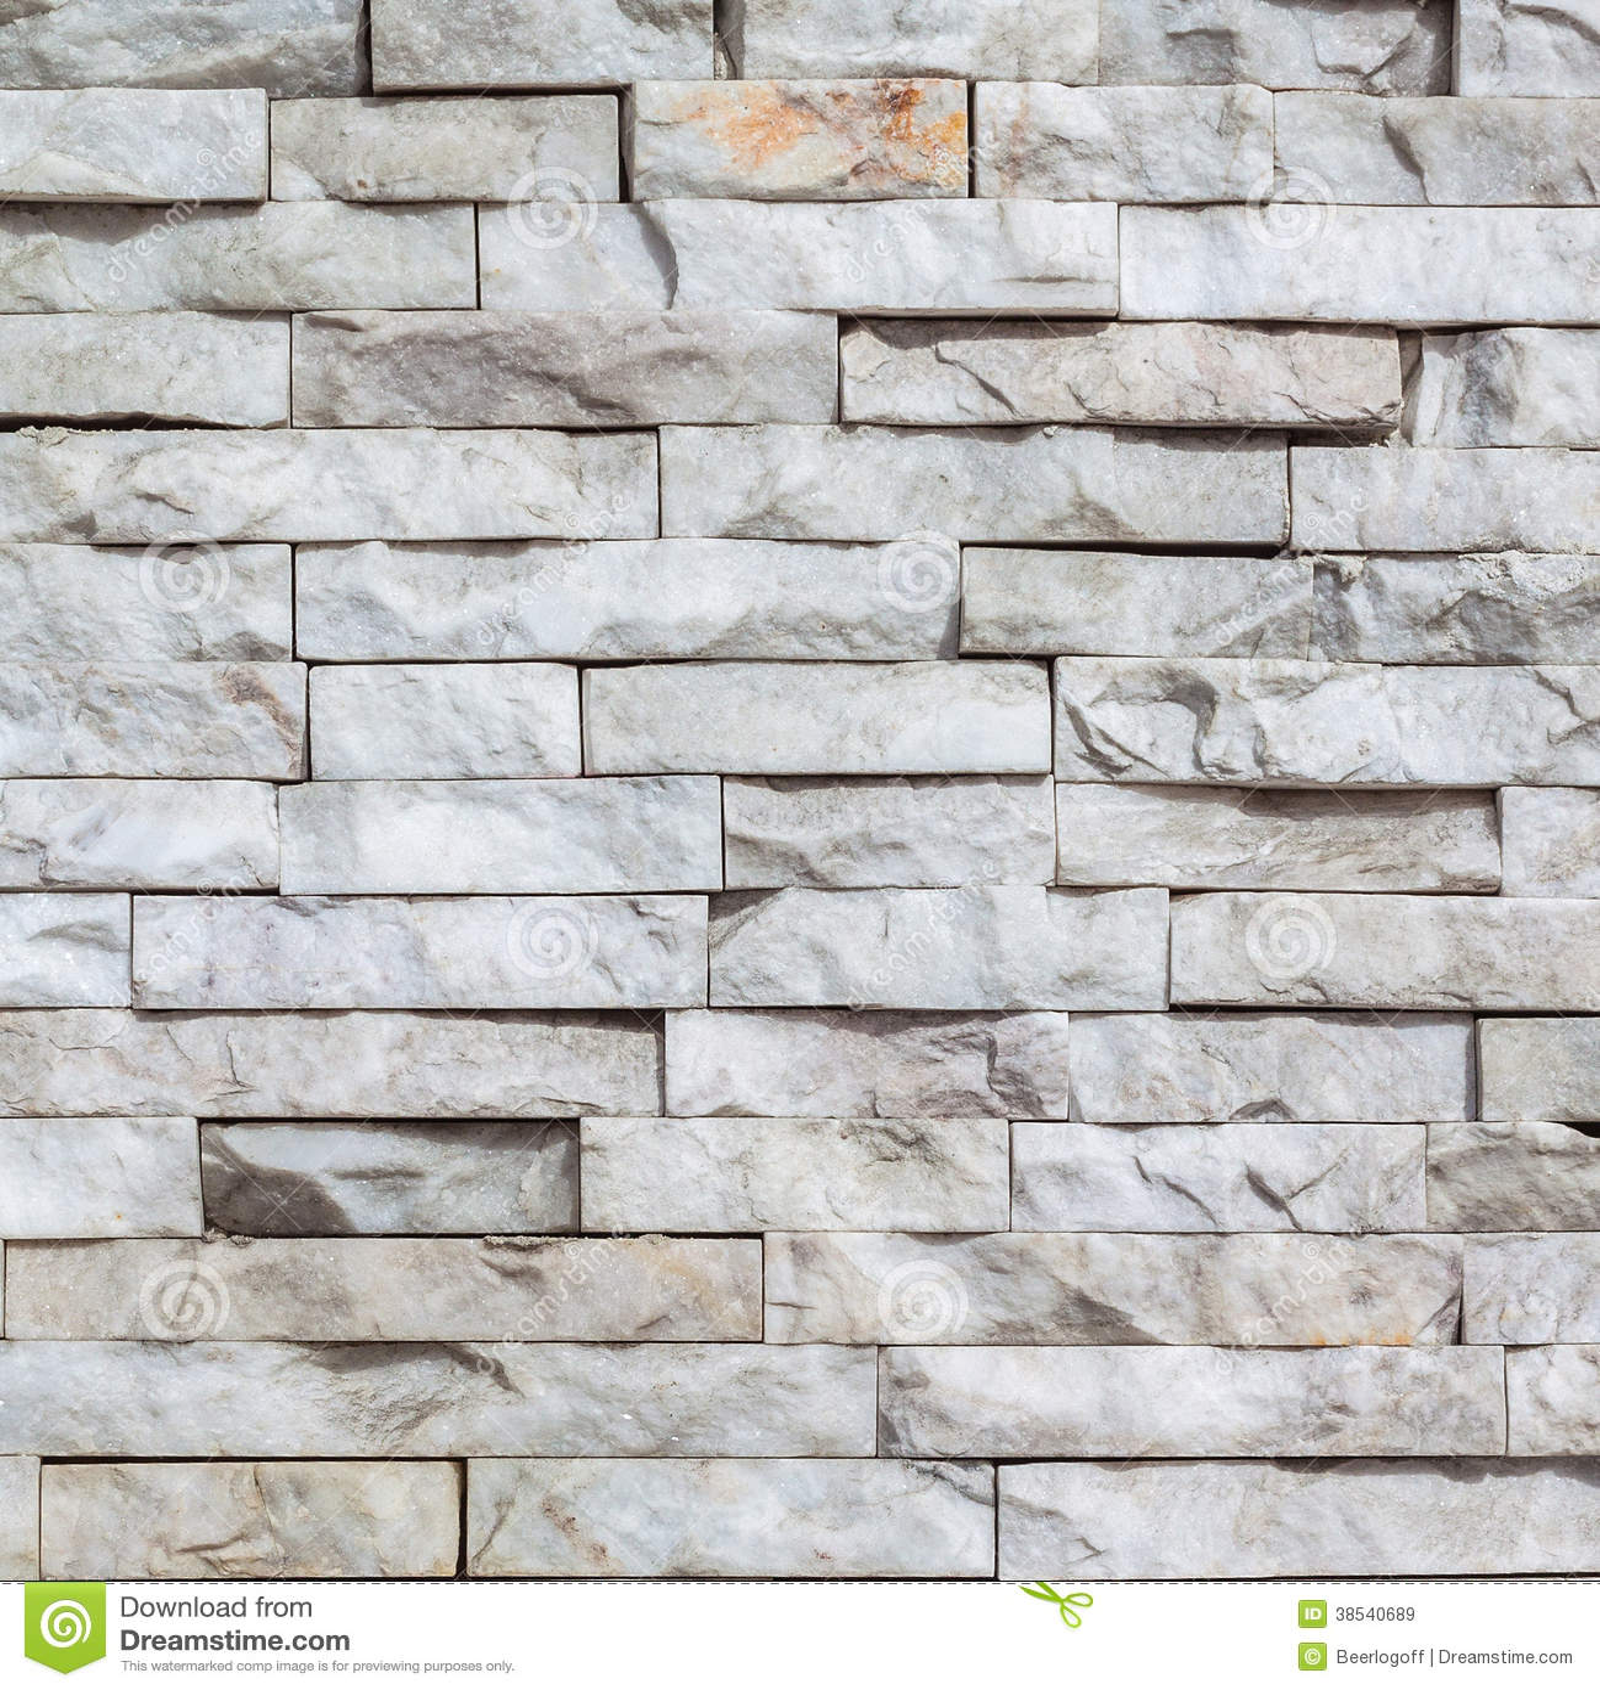 White Marble Texture : White marble brick wall texture stock image